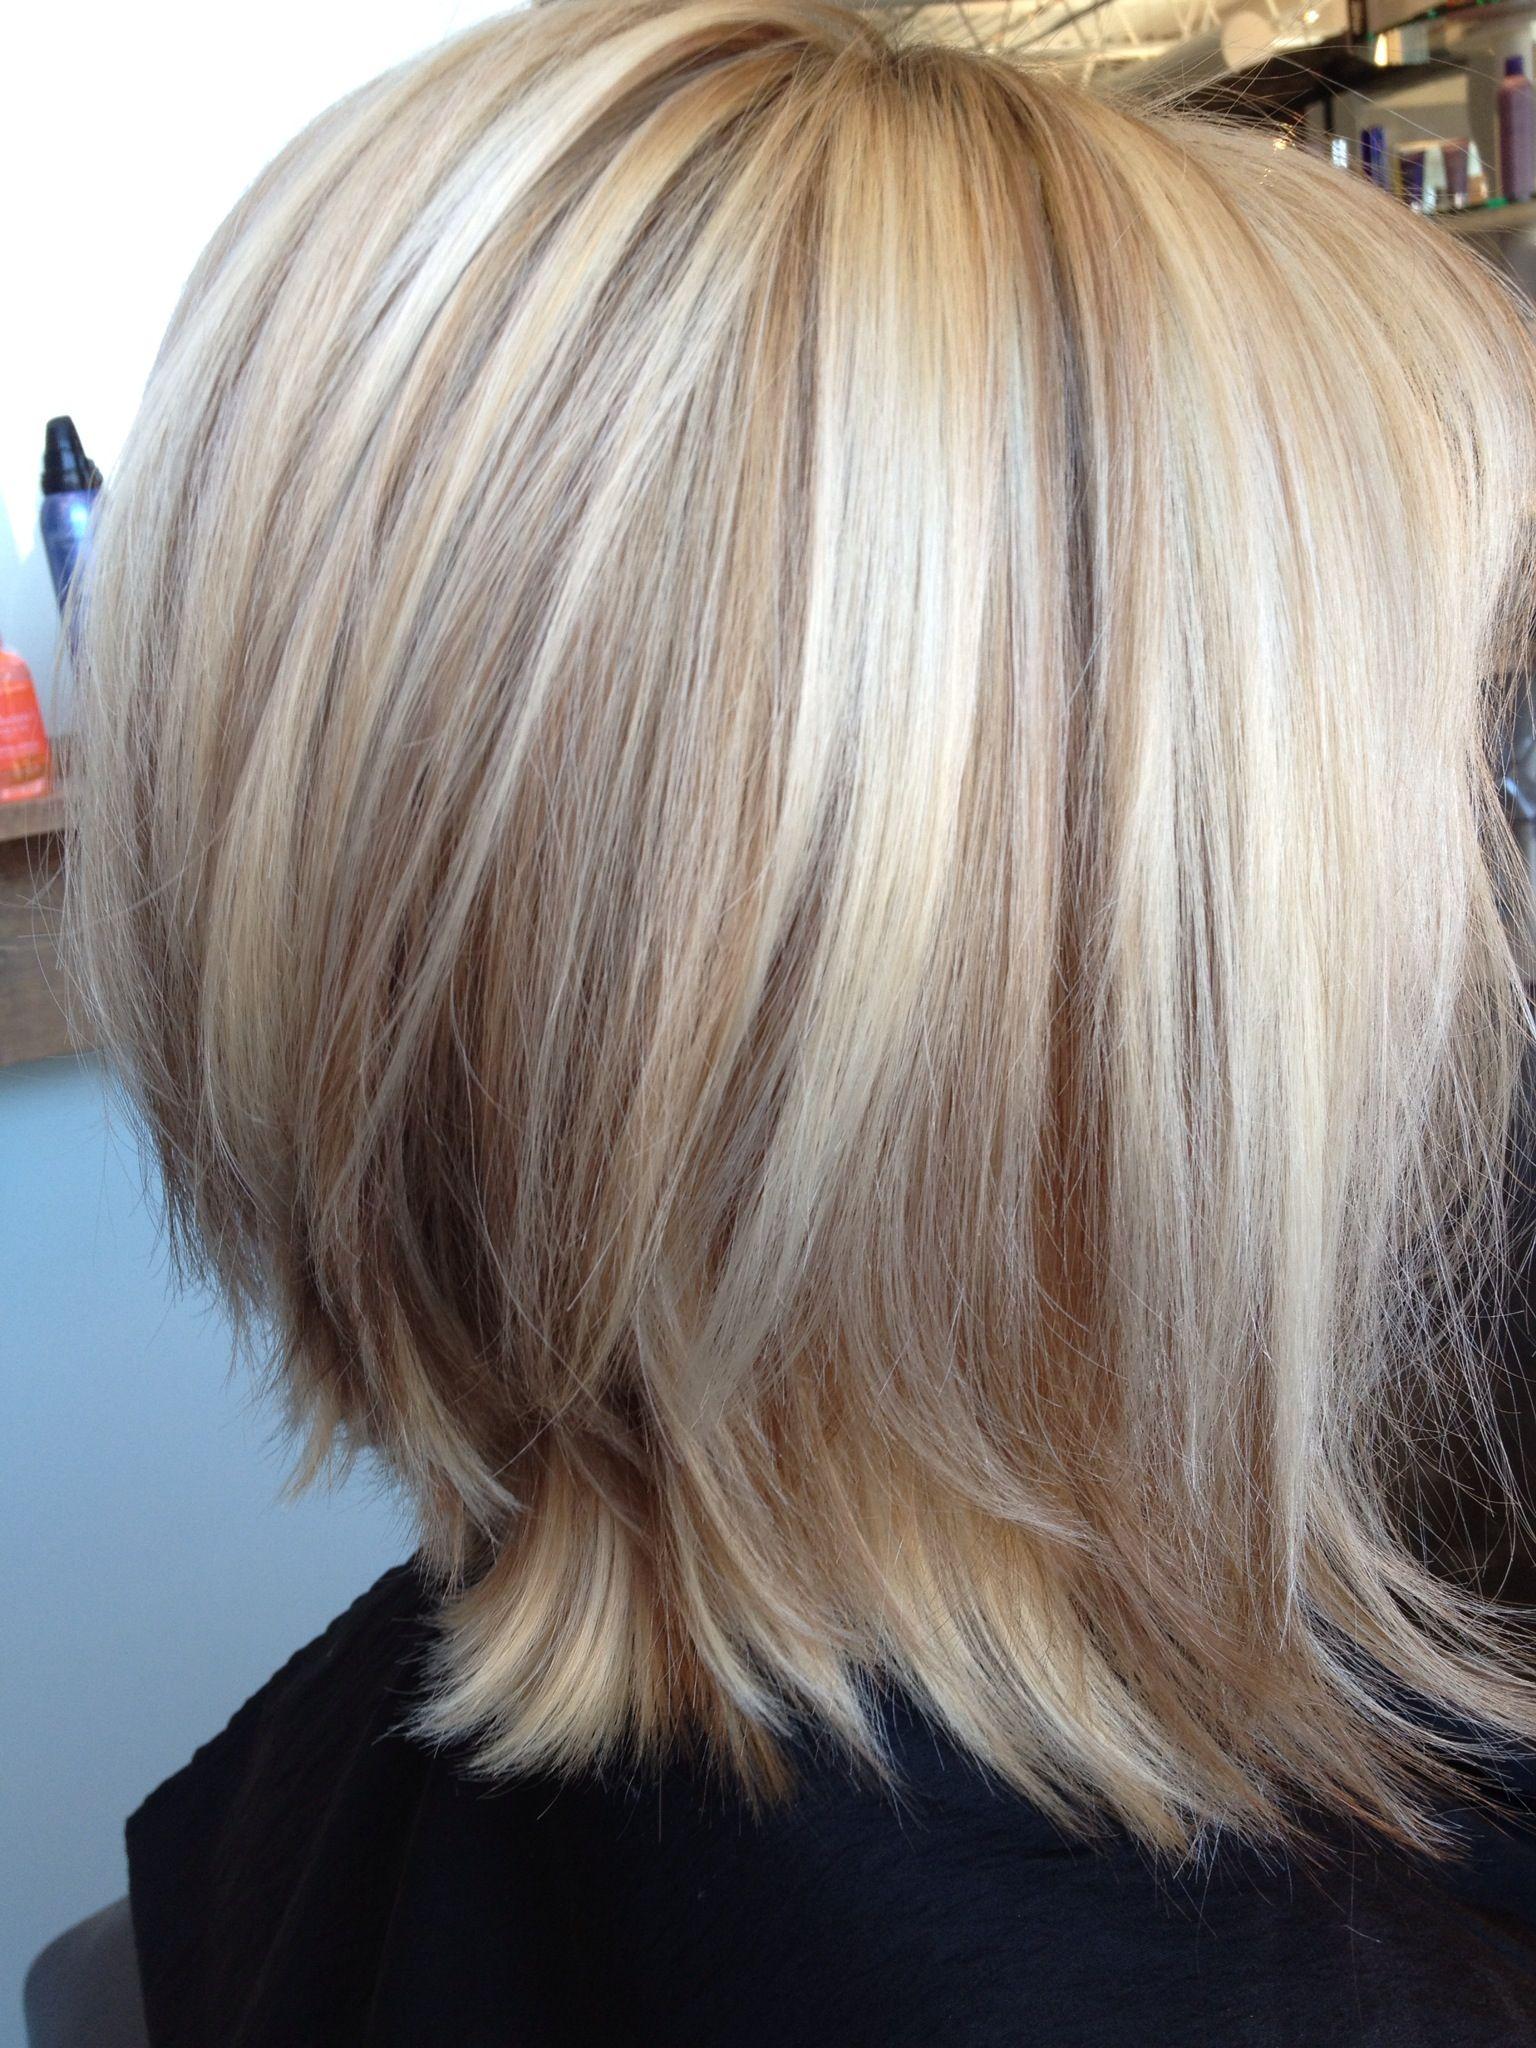 Short Blonde Highlighted Hairdos For Stylish Ladies Hair